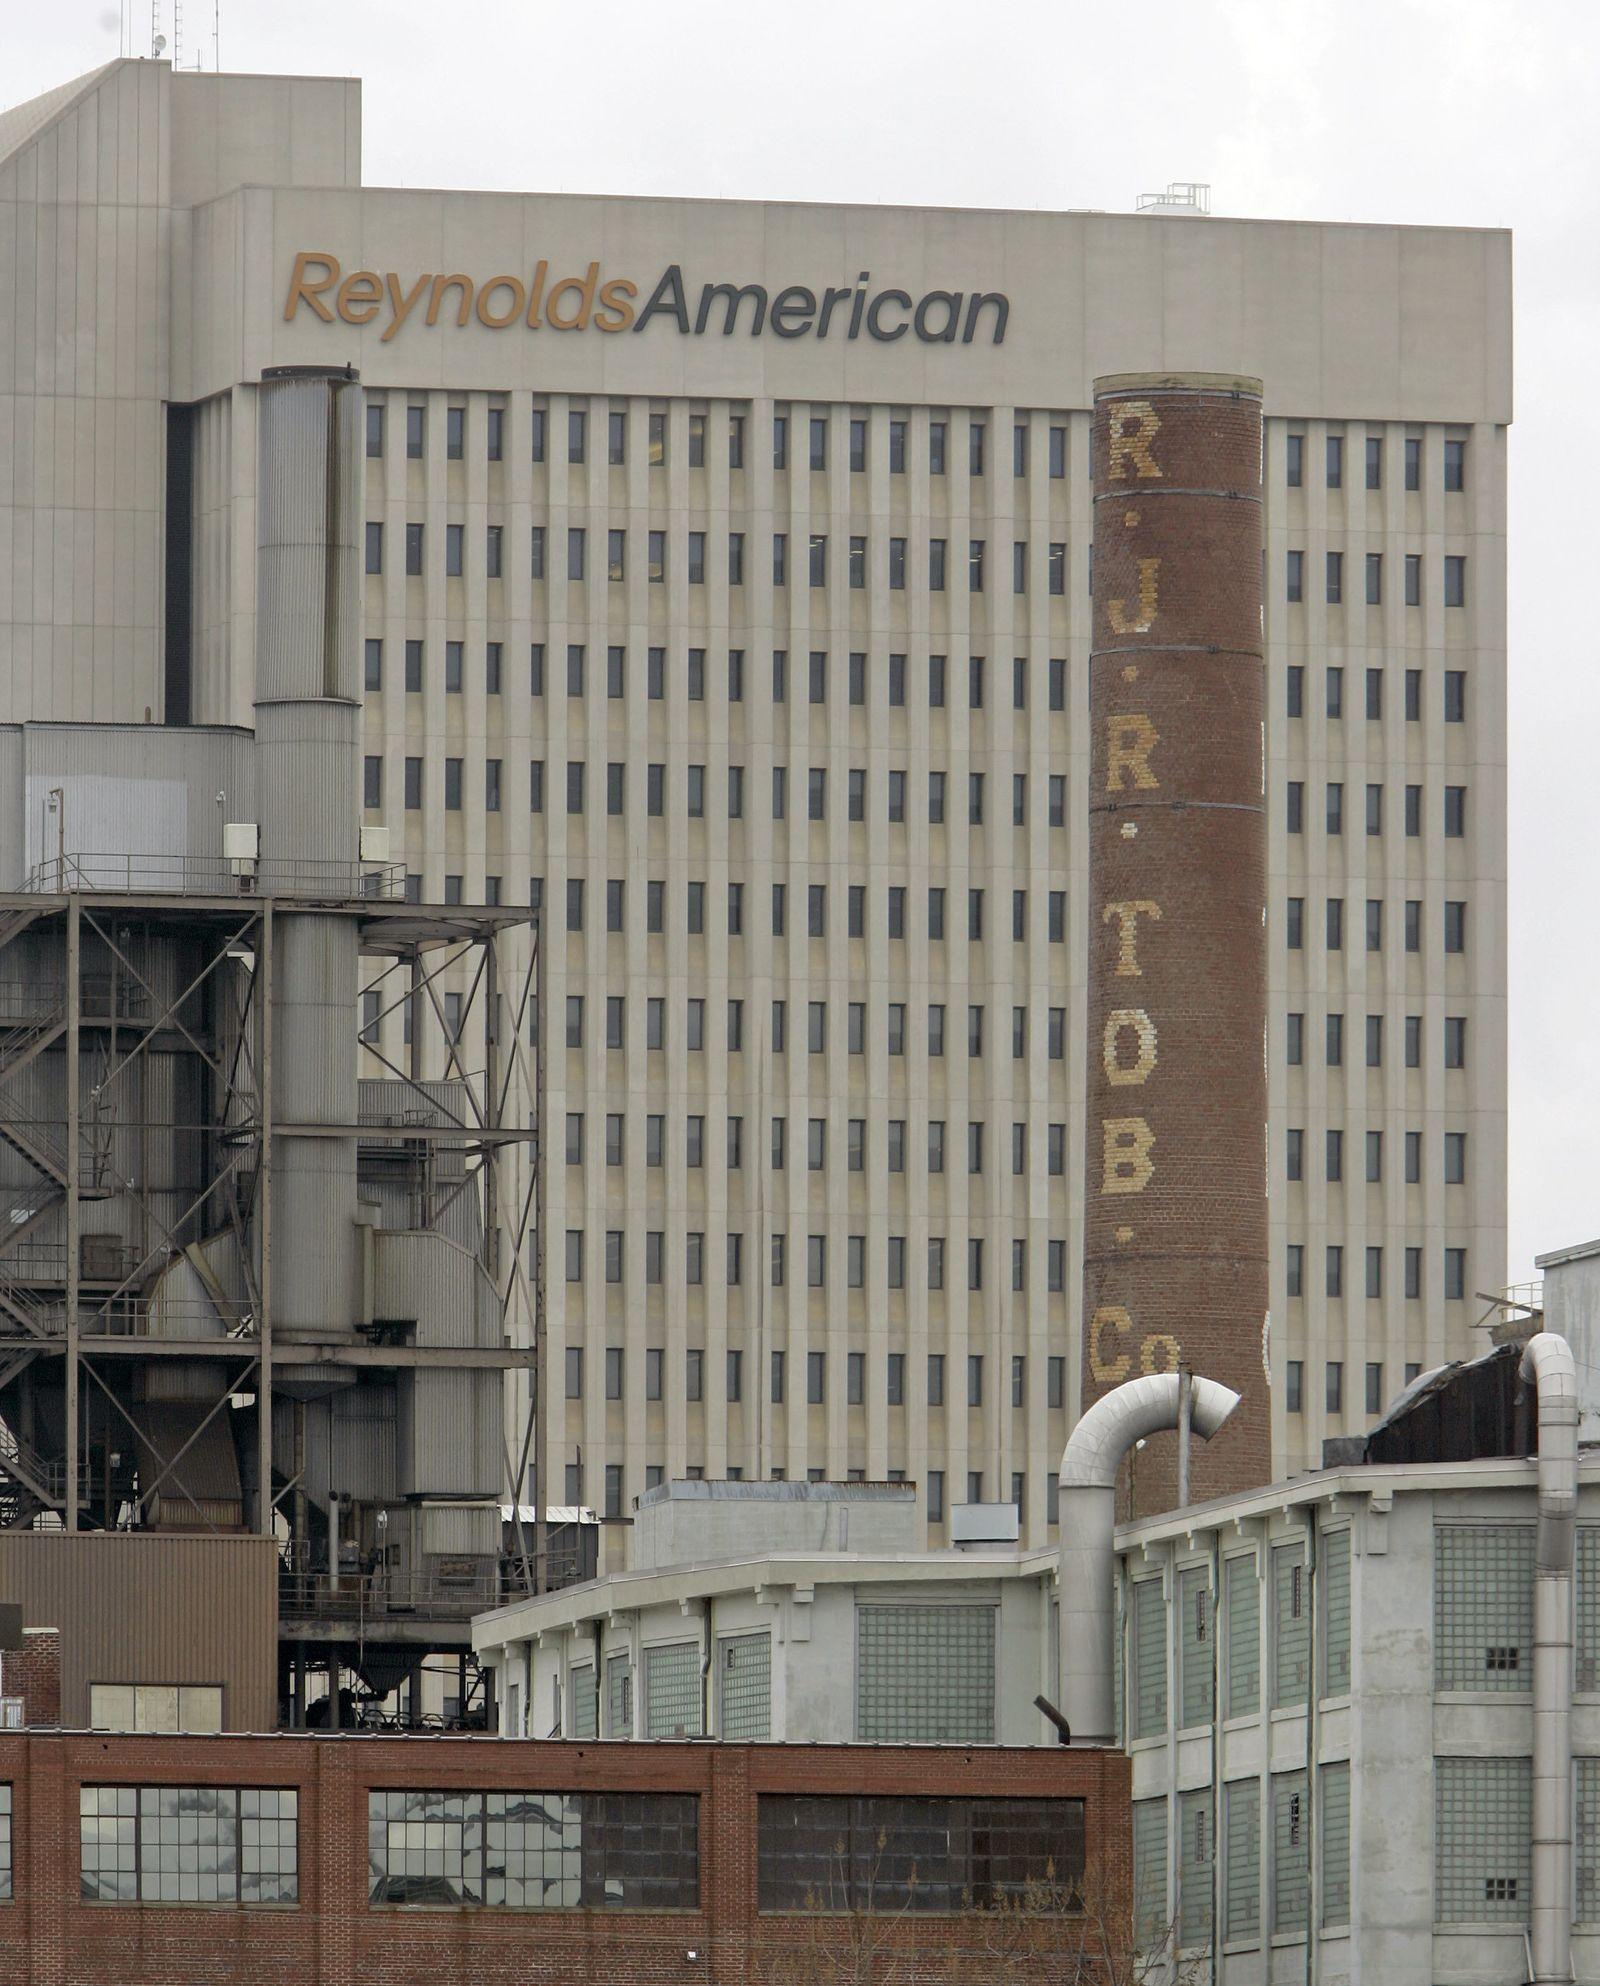 Reynolds / Tabakkonzern